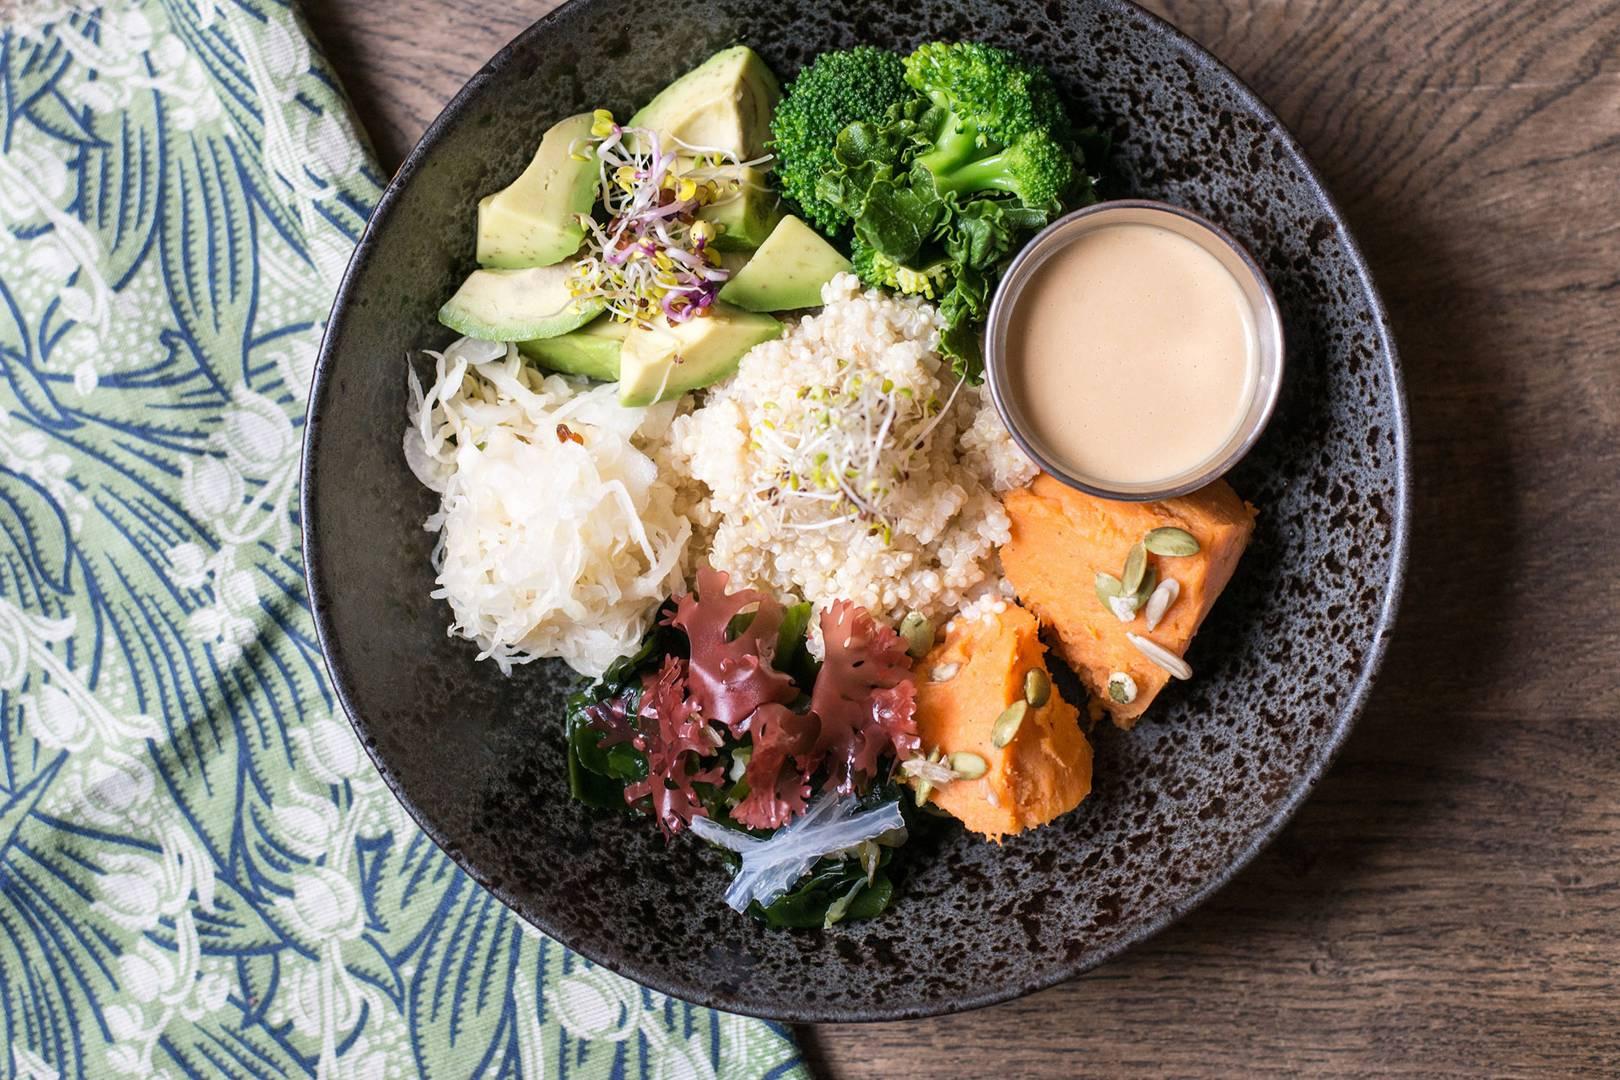 Best Vegan Restaurants In London